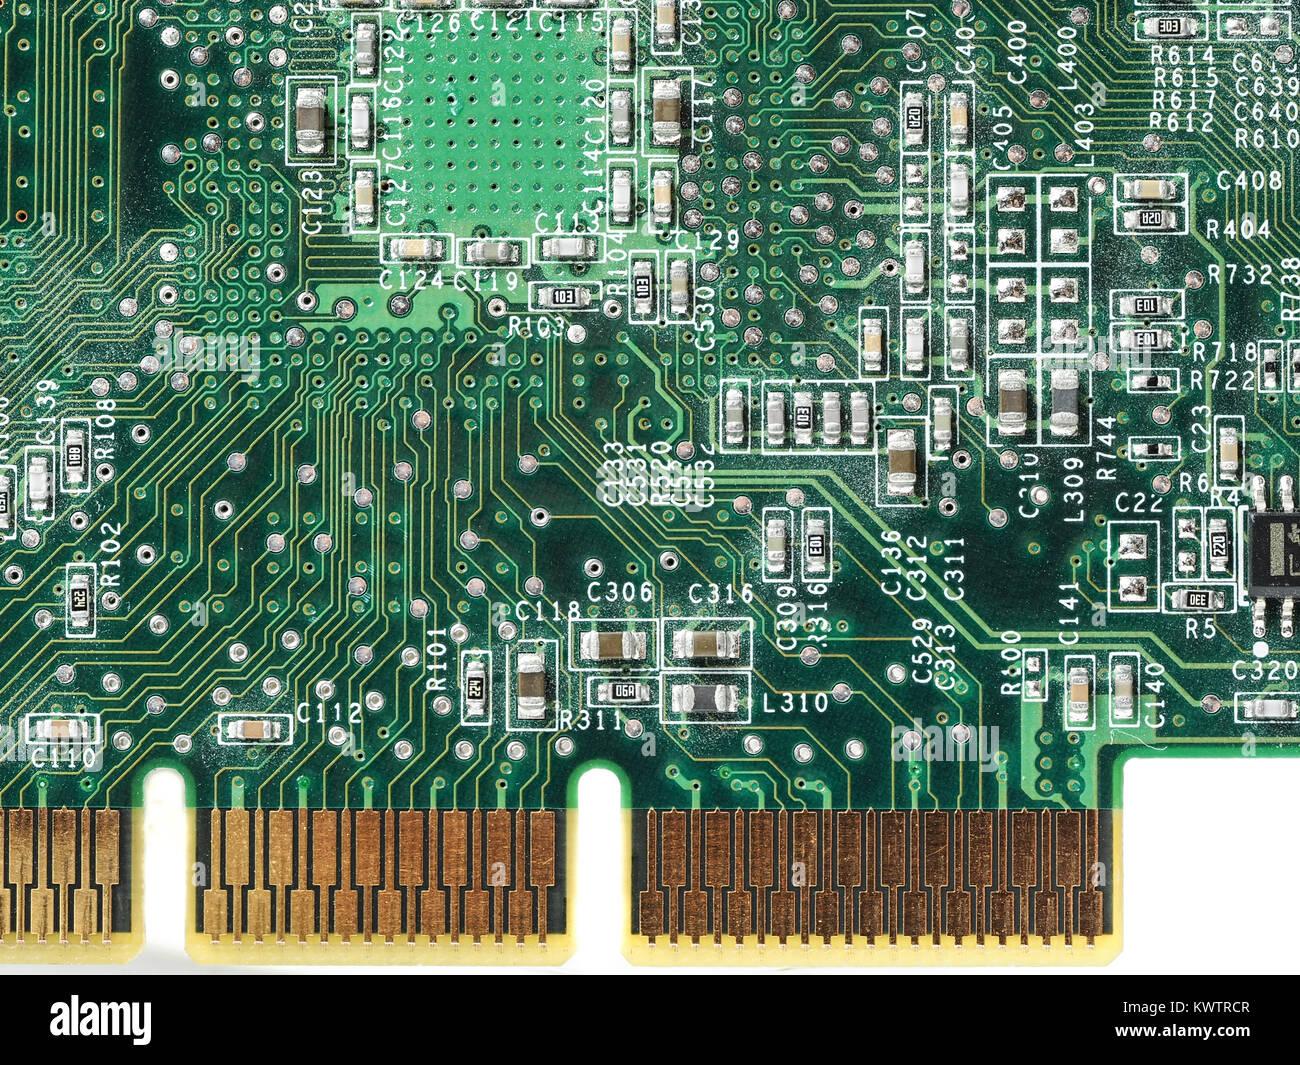 Brilliant Printed Wiring Board Stockfotos Printed Wiring Board Bilder Alamy Wiring Cloud Strefoxcilixyz